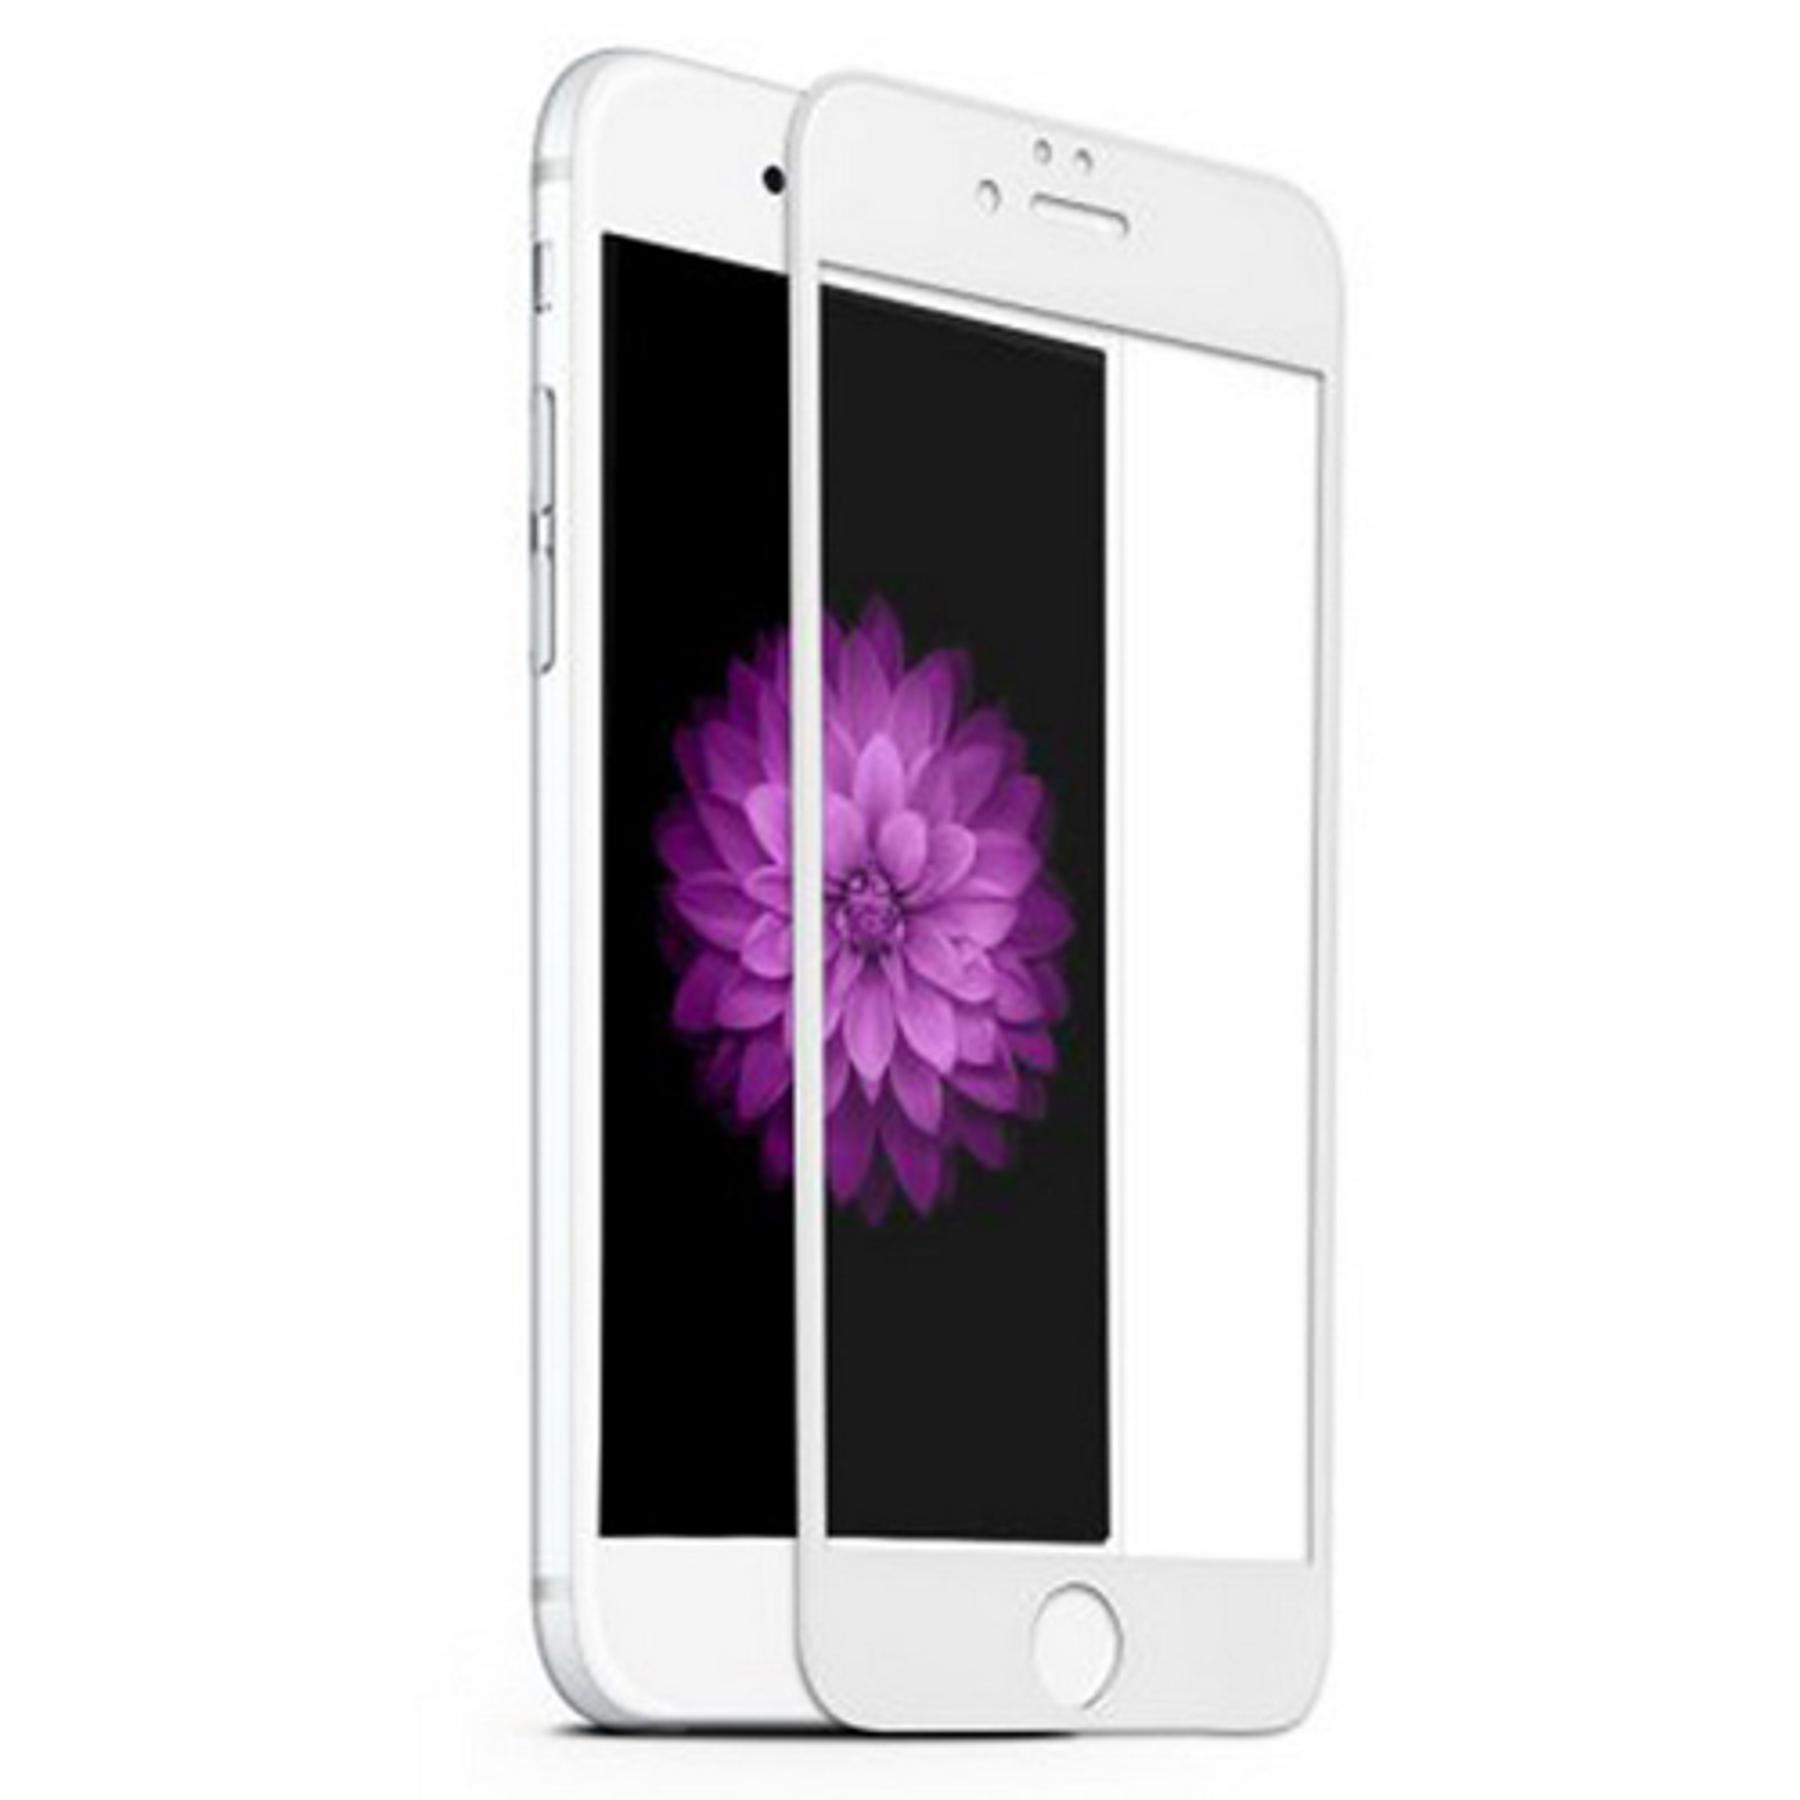 Iphone 7 / 8 Plus - Lámina Vidrio Templado Completa